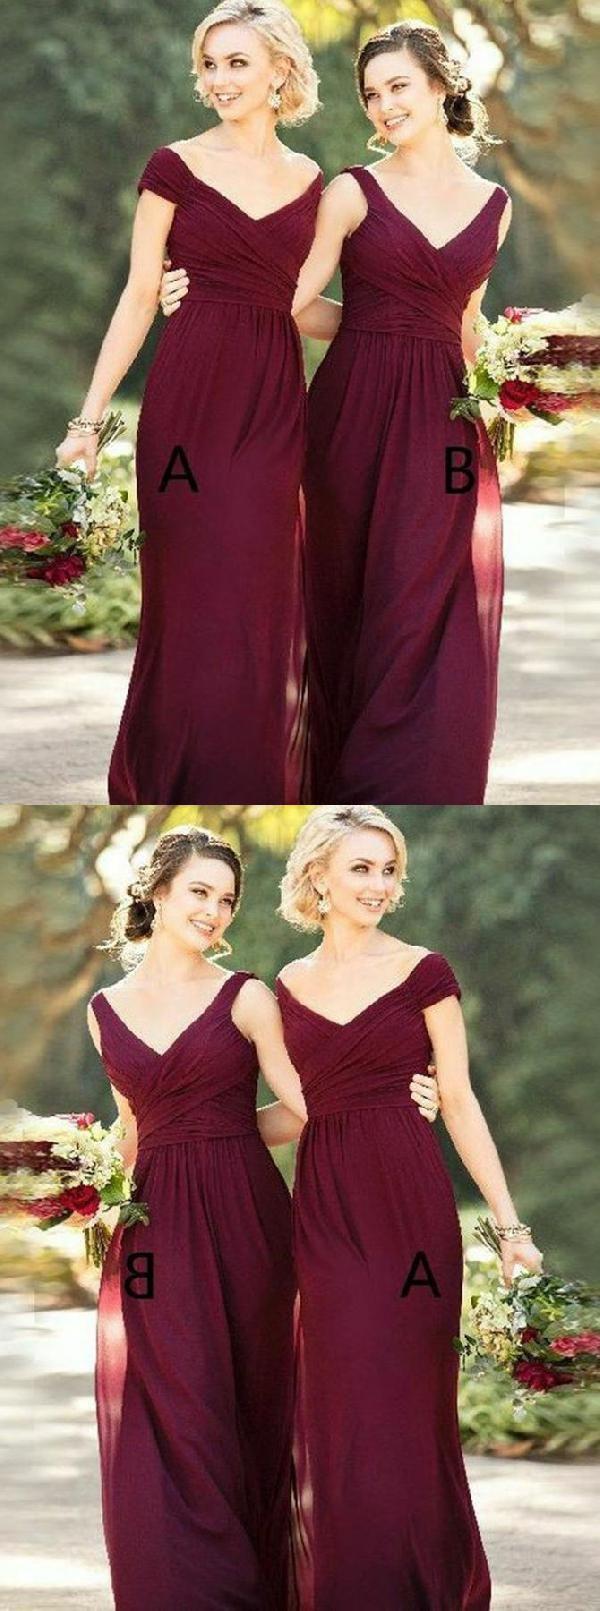 Discount Colorful Bridesmaid Dress Long, Burgundy Bridesmaid Dress